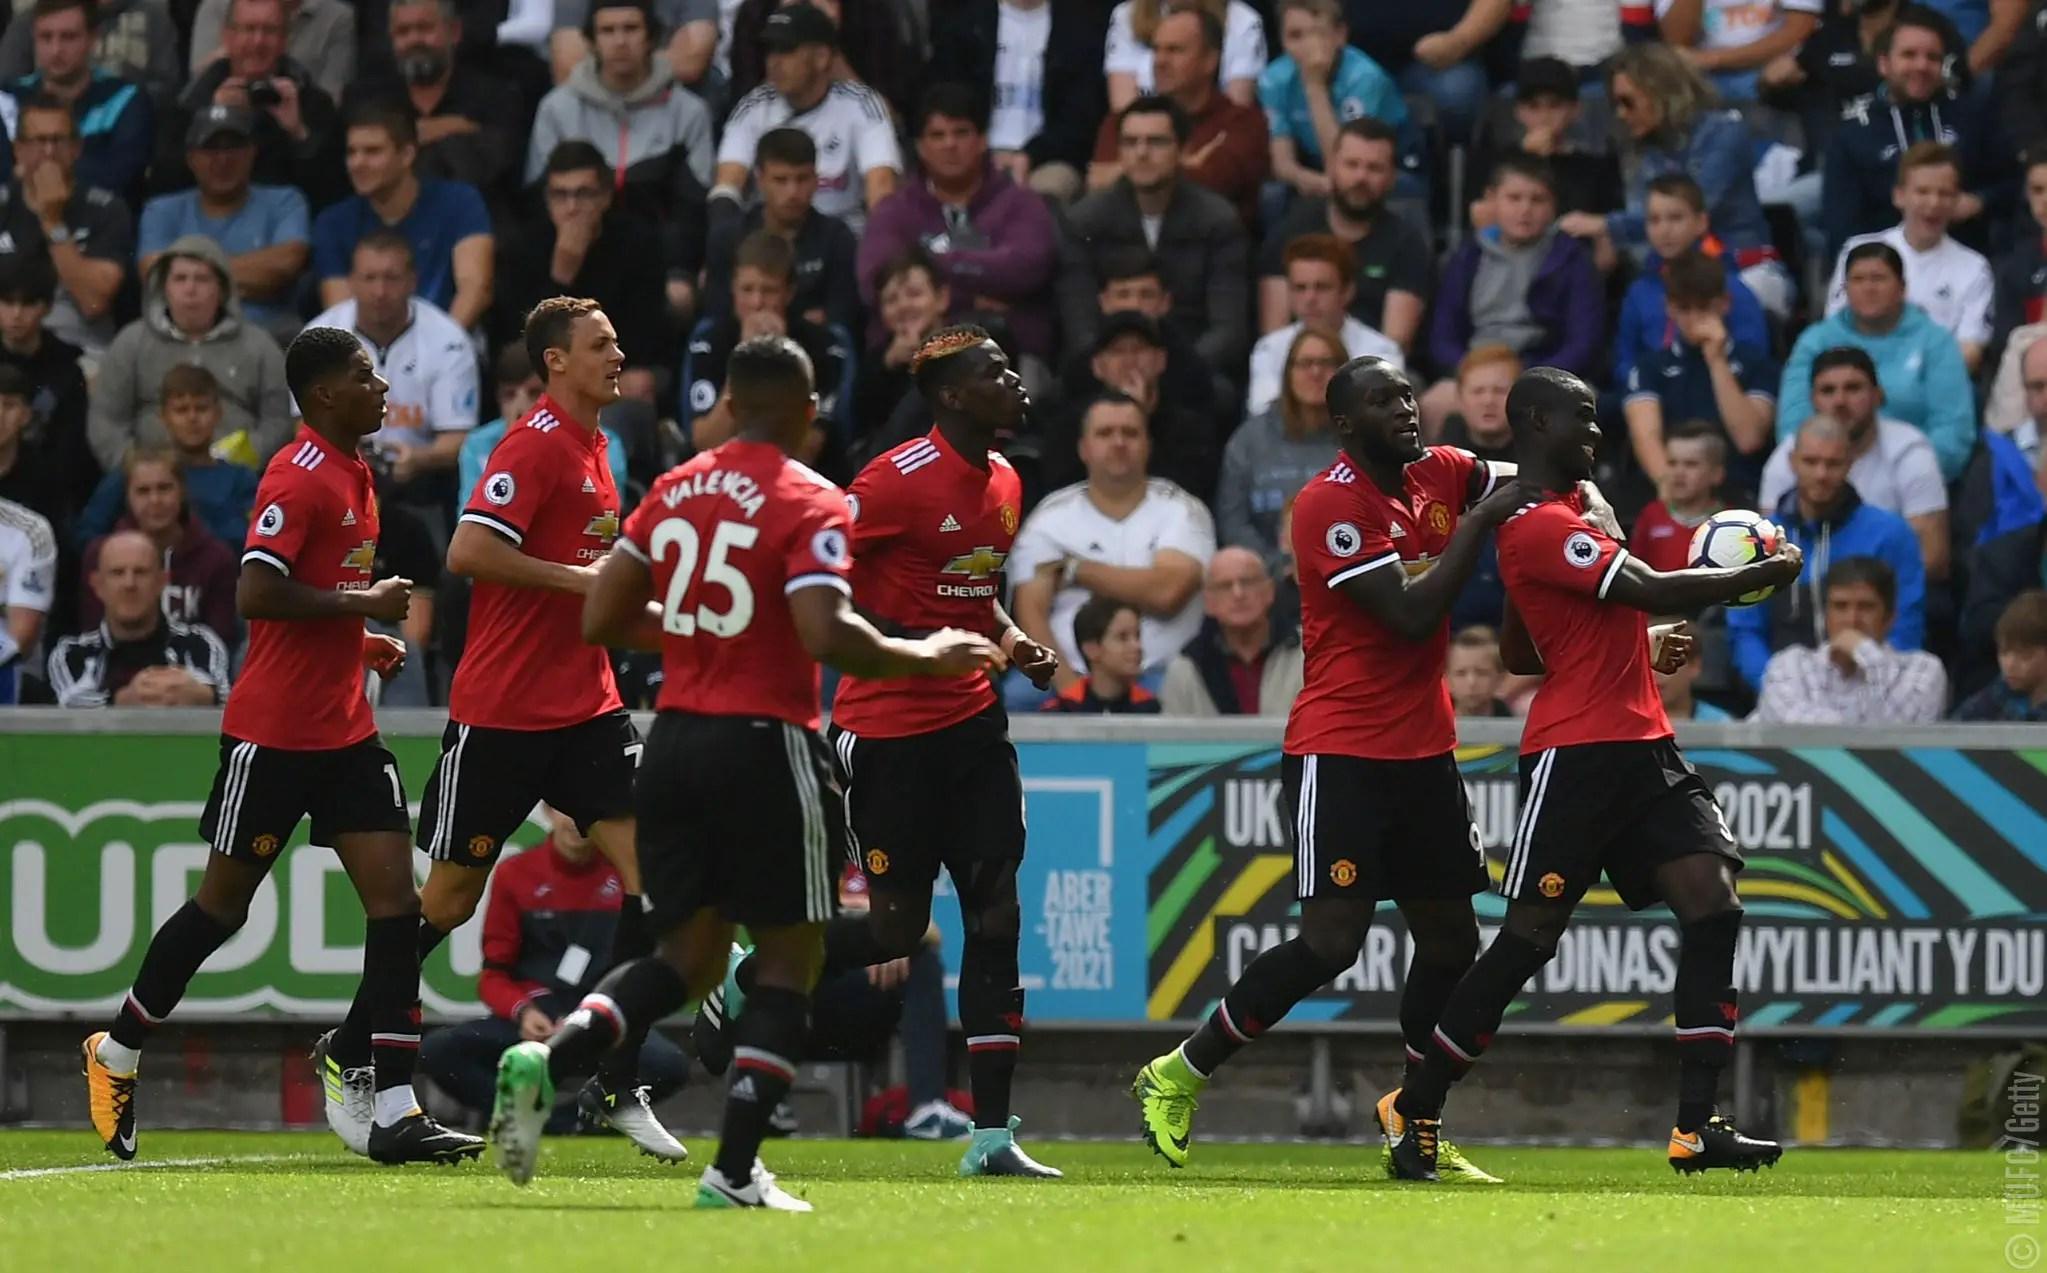 Bailly Scores Historic Goal As Lukaku, Pogba Fire Man United Past Swansea